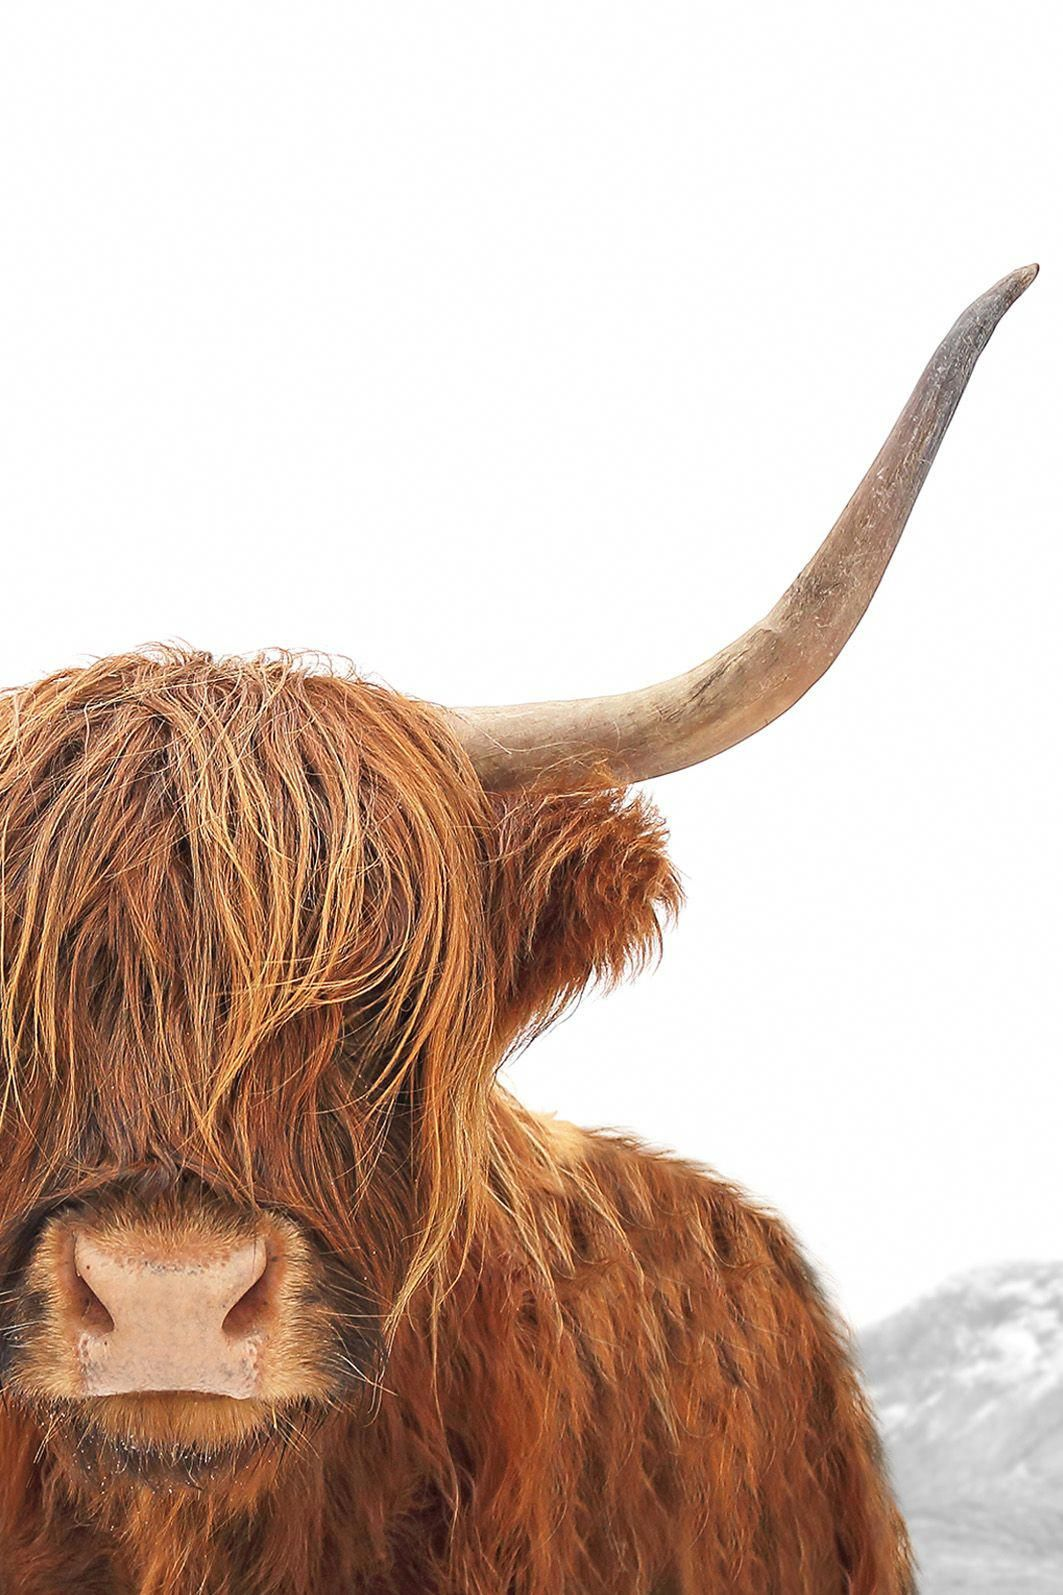 Scottish Highland Cow Art Highland Cow Photography Print Beautiful Animal Photography Wall Art By Litt Highland Cow Art Cow Photography Highland Cow Print